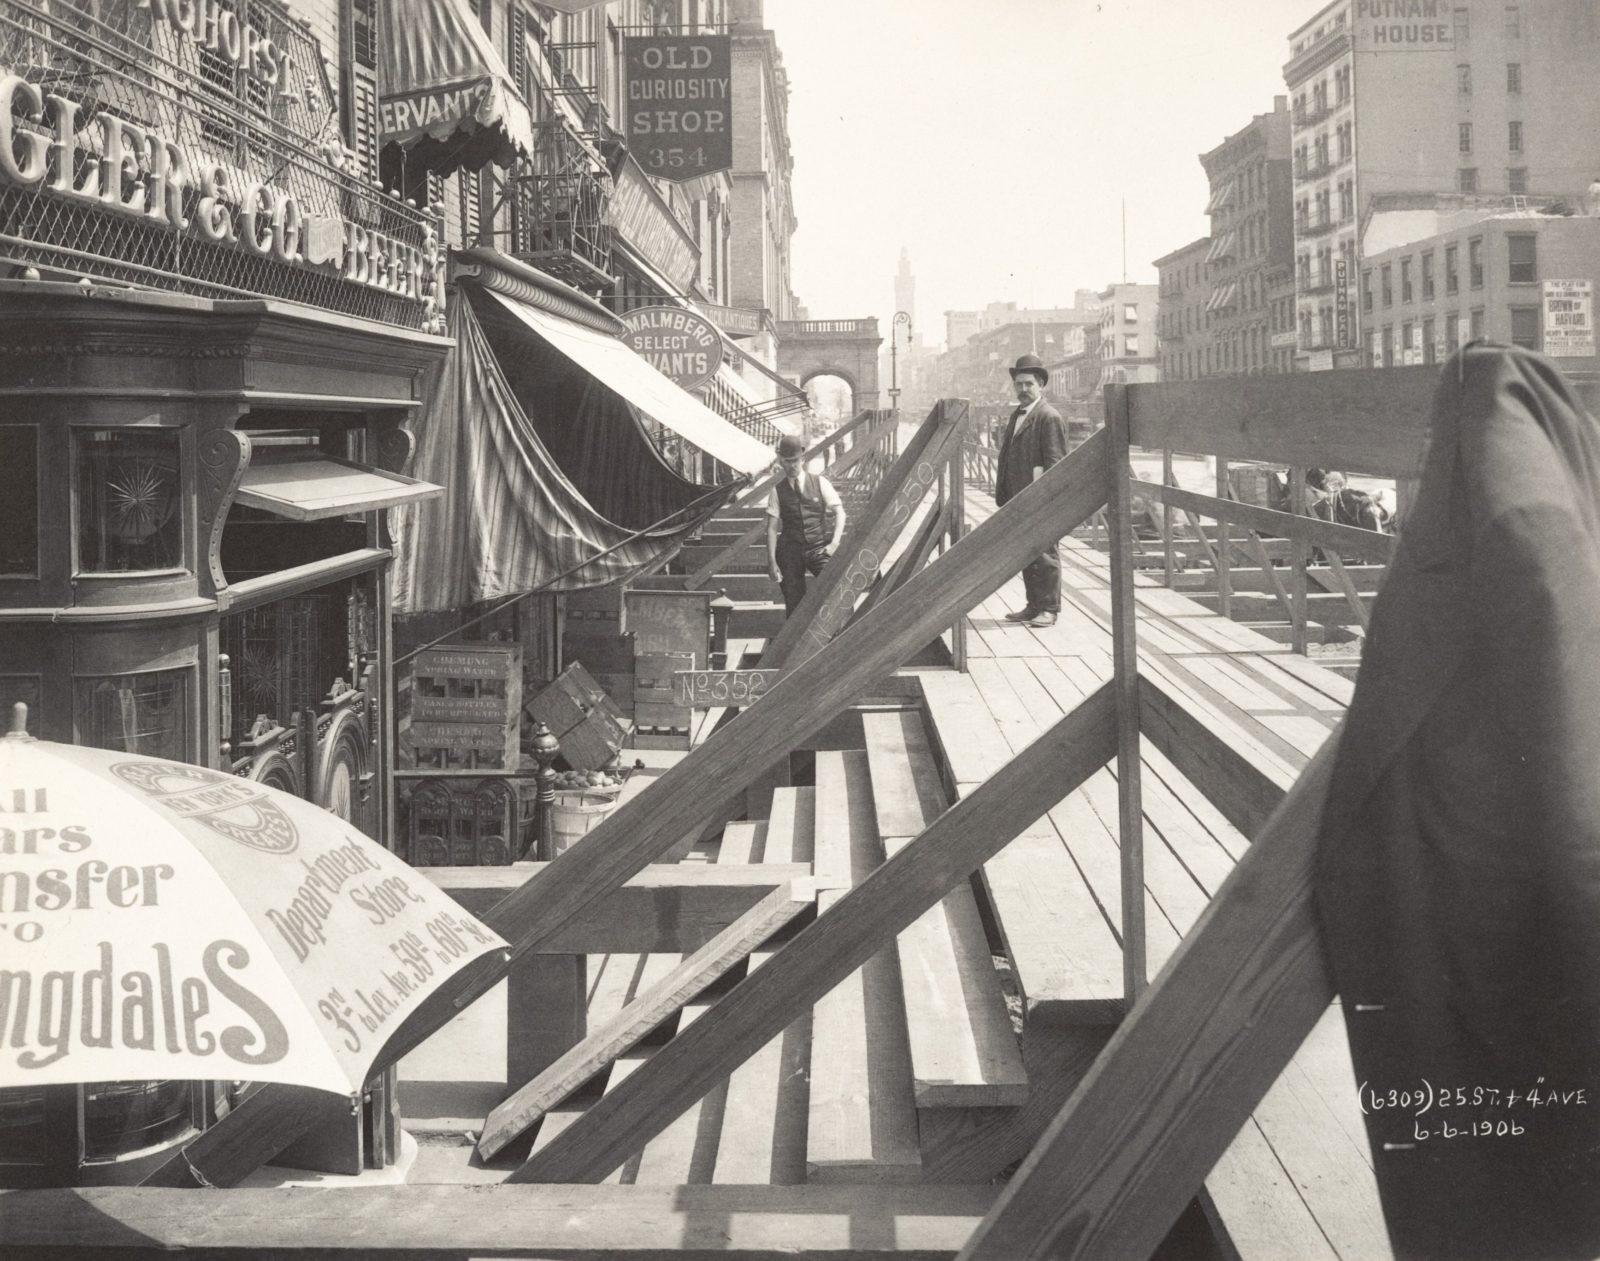 [Interborough Rapid Transit (IRT) Construction, 25th Street and Fourth Avenue, New York City]